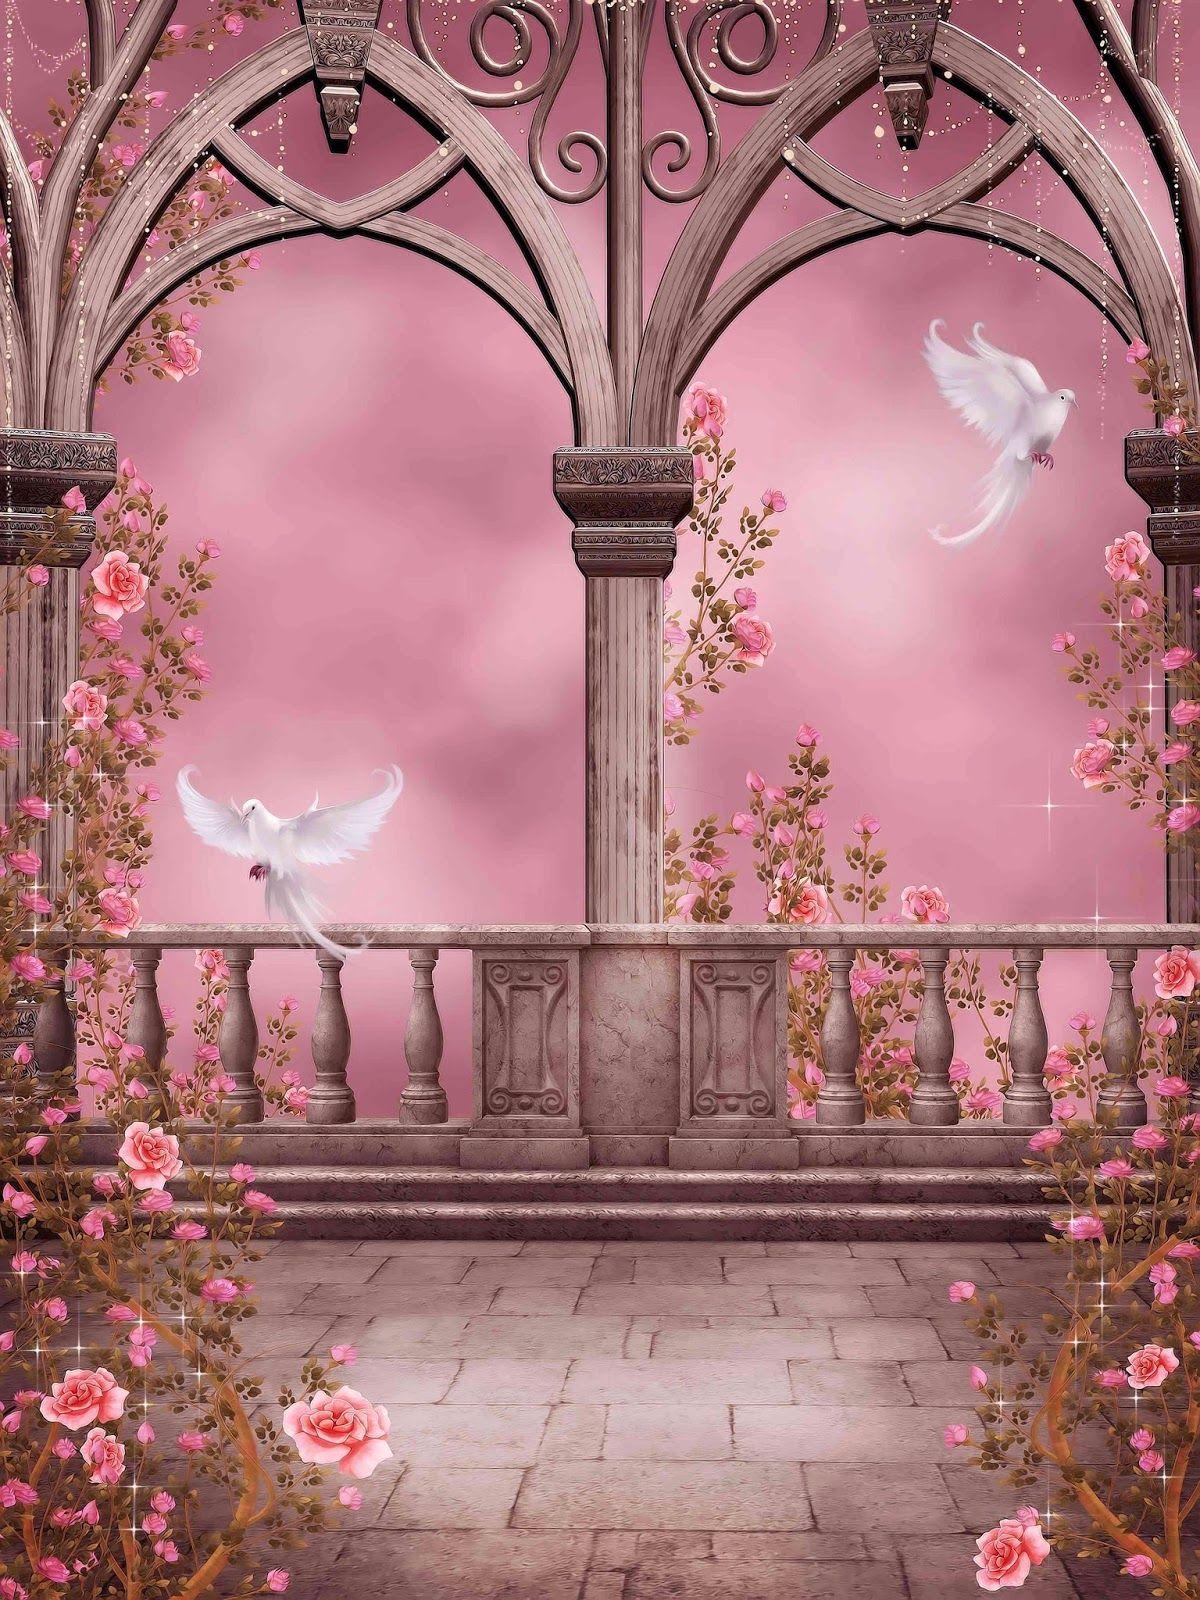 خلفيات استوديو للتصميم جودة عالية Hd اخبار العراق Studio Background Images Anime Backgrounds Wallpapers Photoshop Backgrounds Free